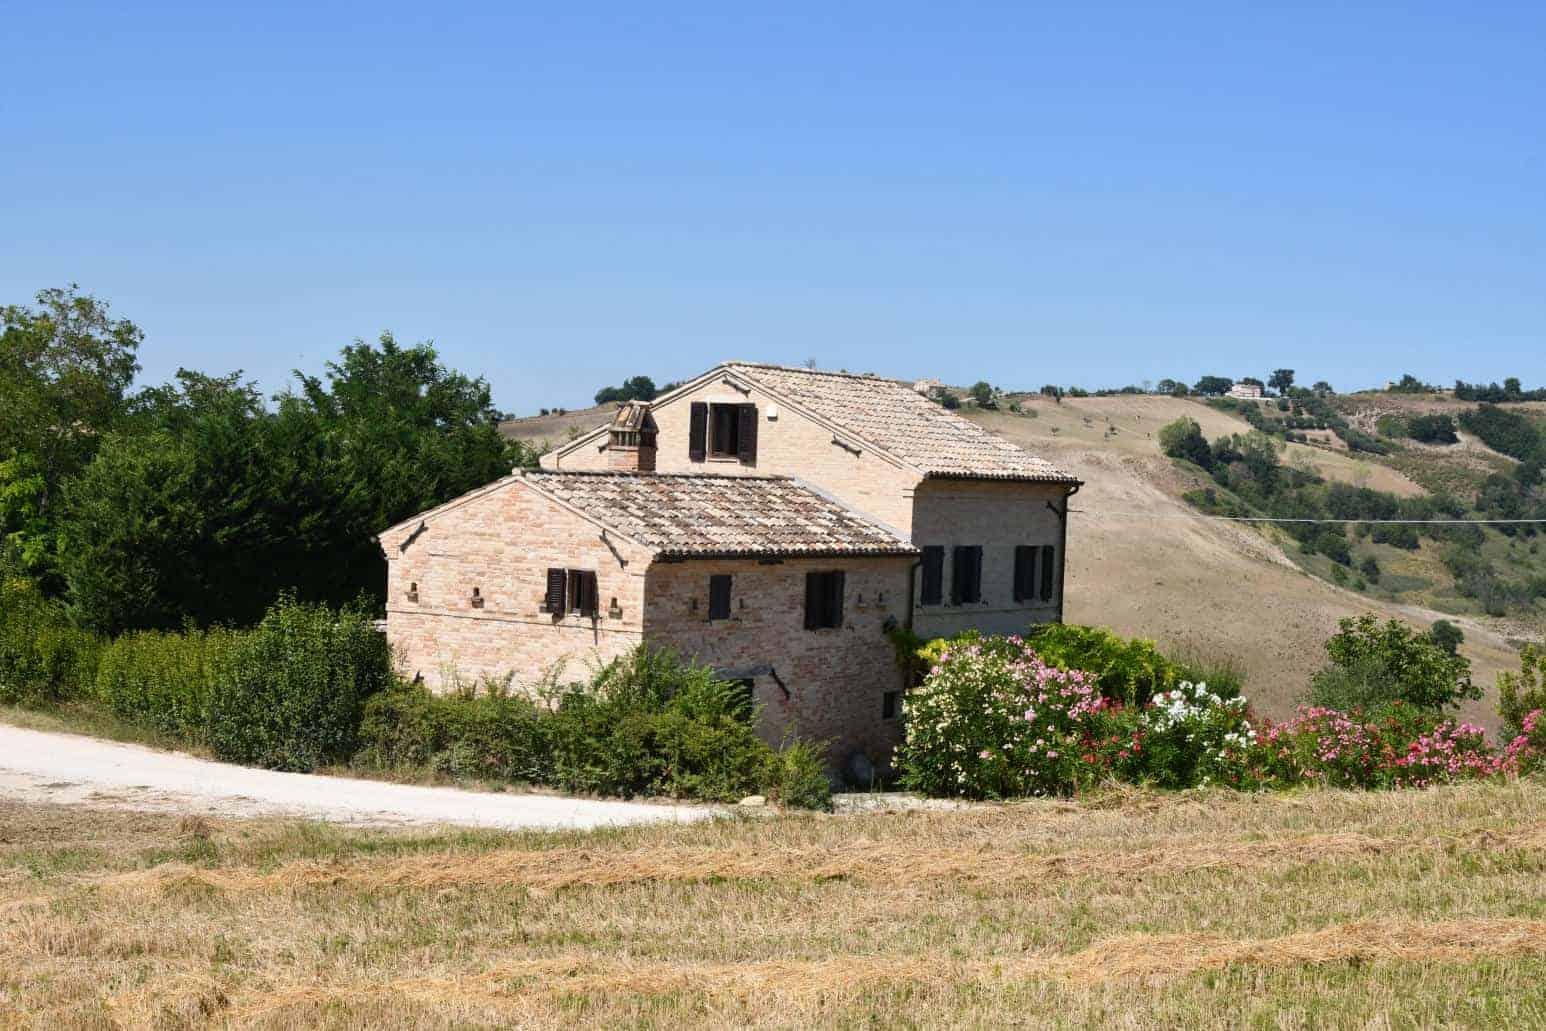 Restored countryhouse near Petritoli